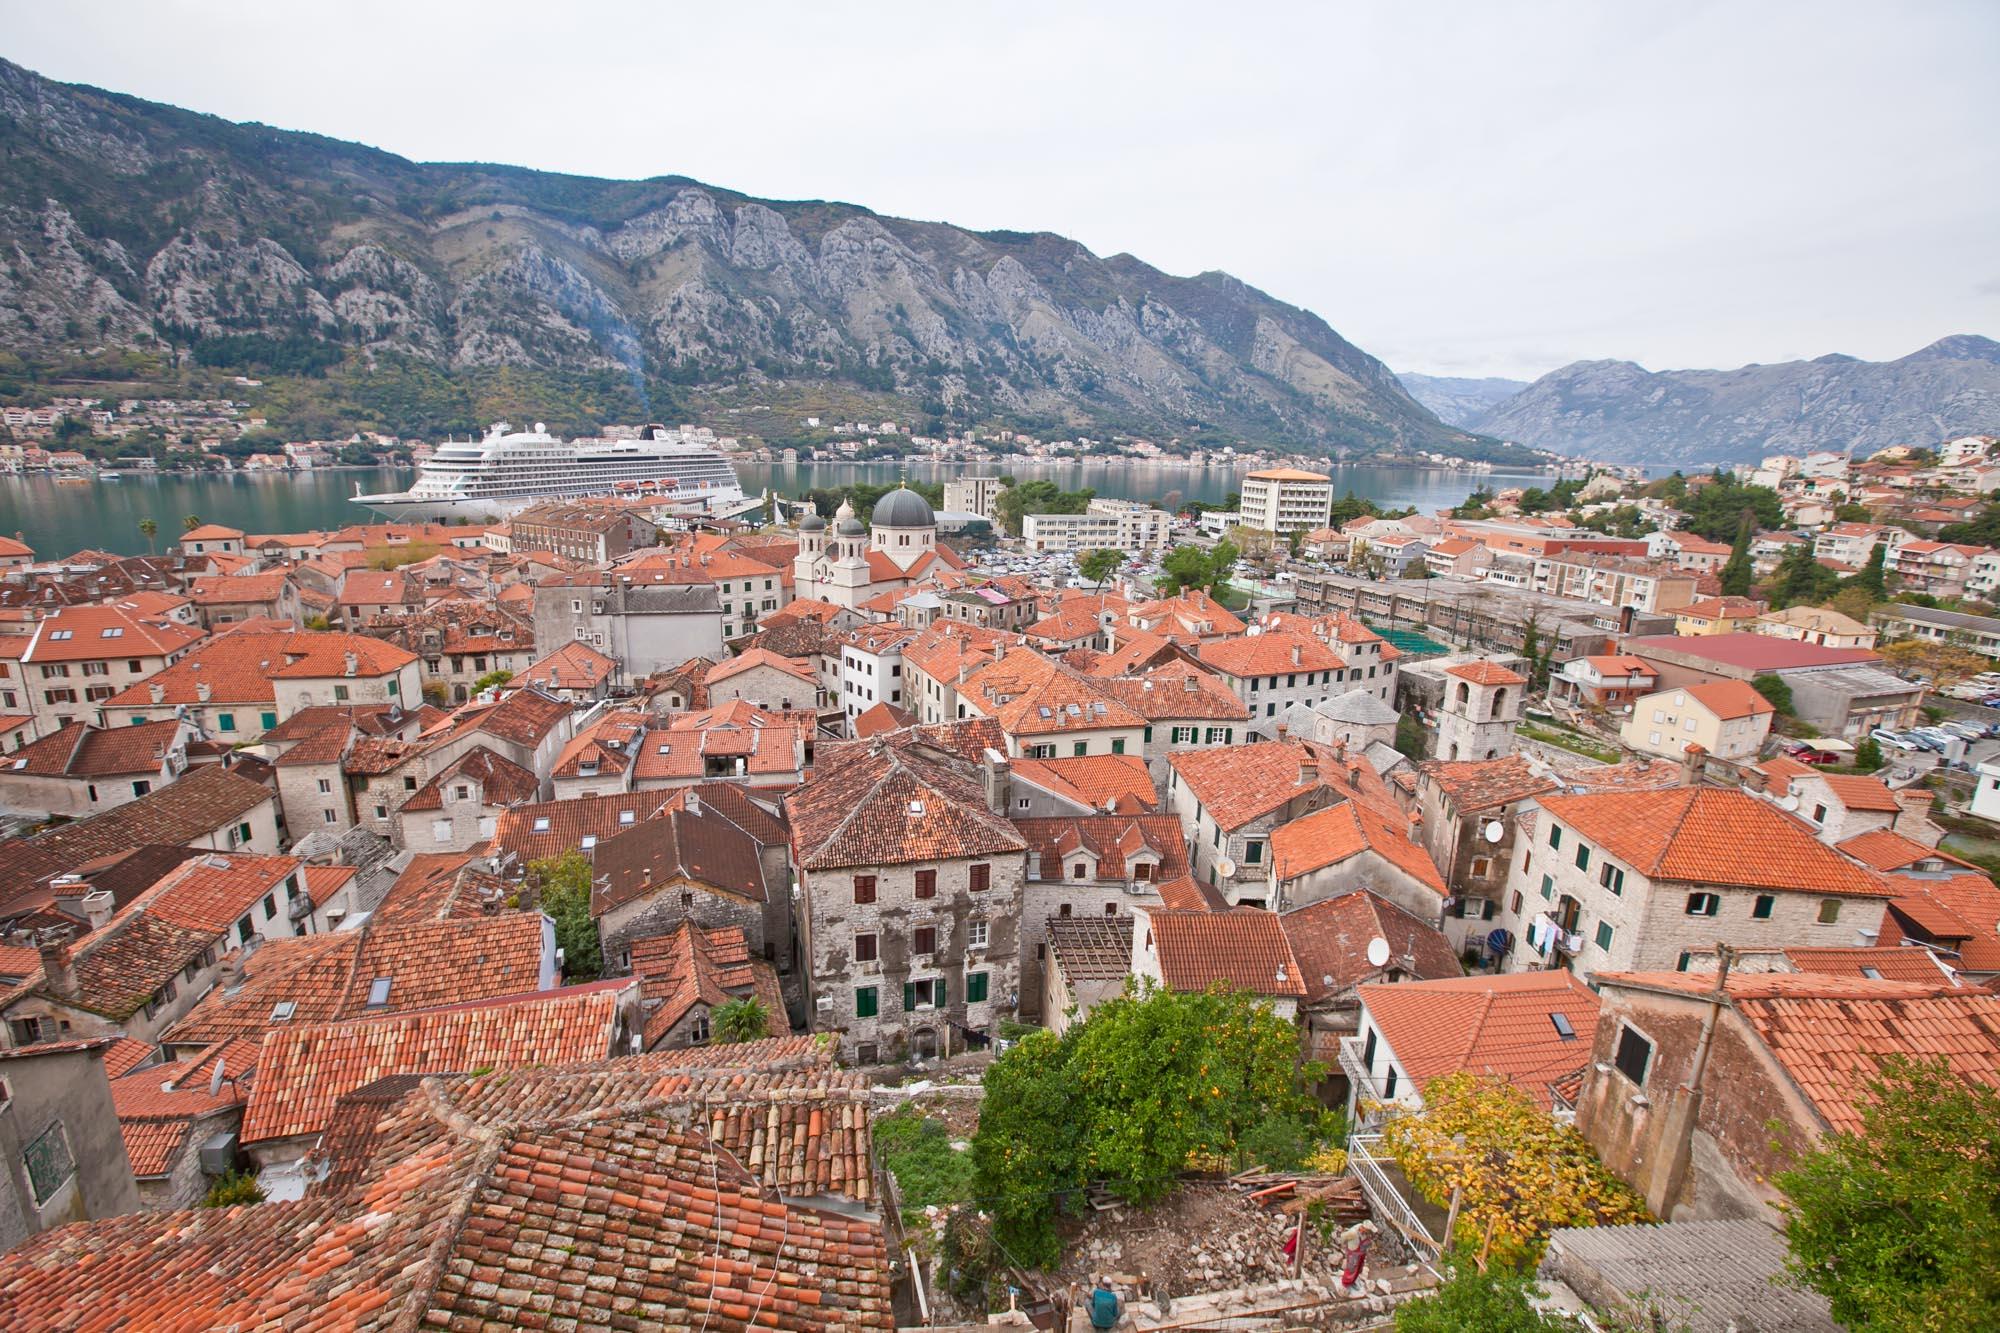 Kotor cityscape